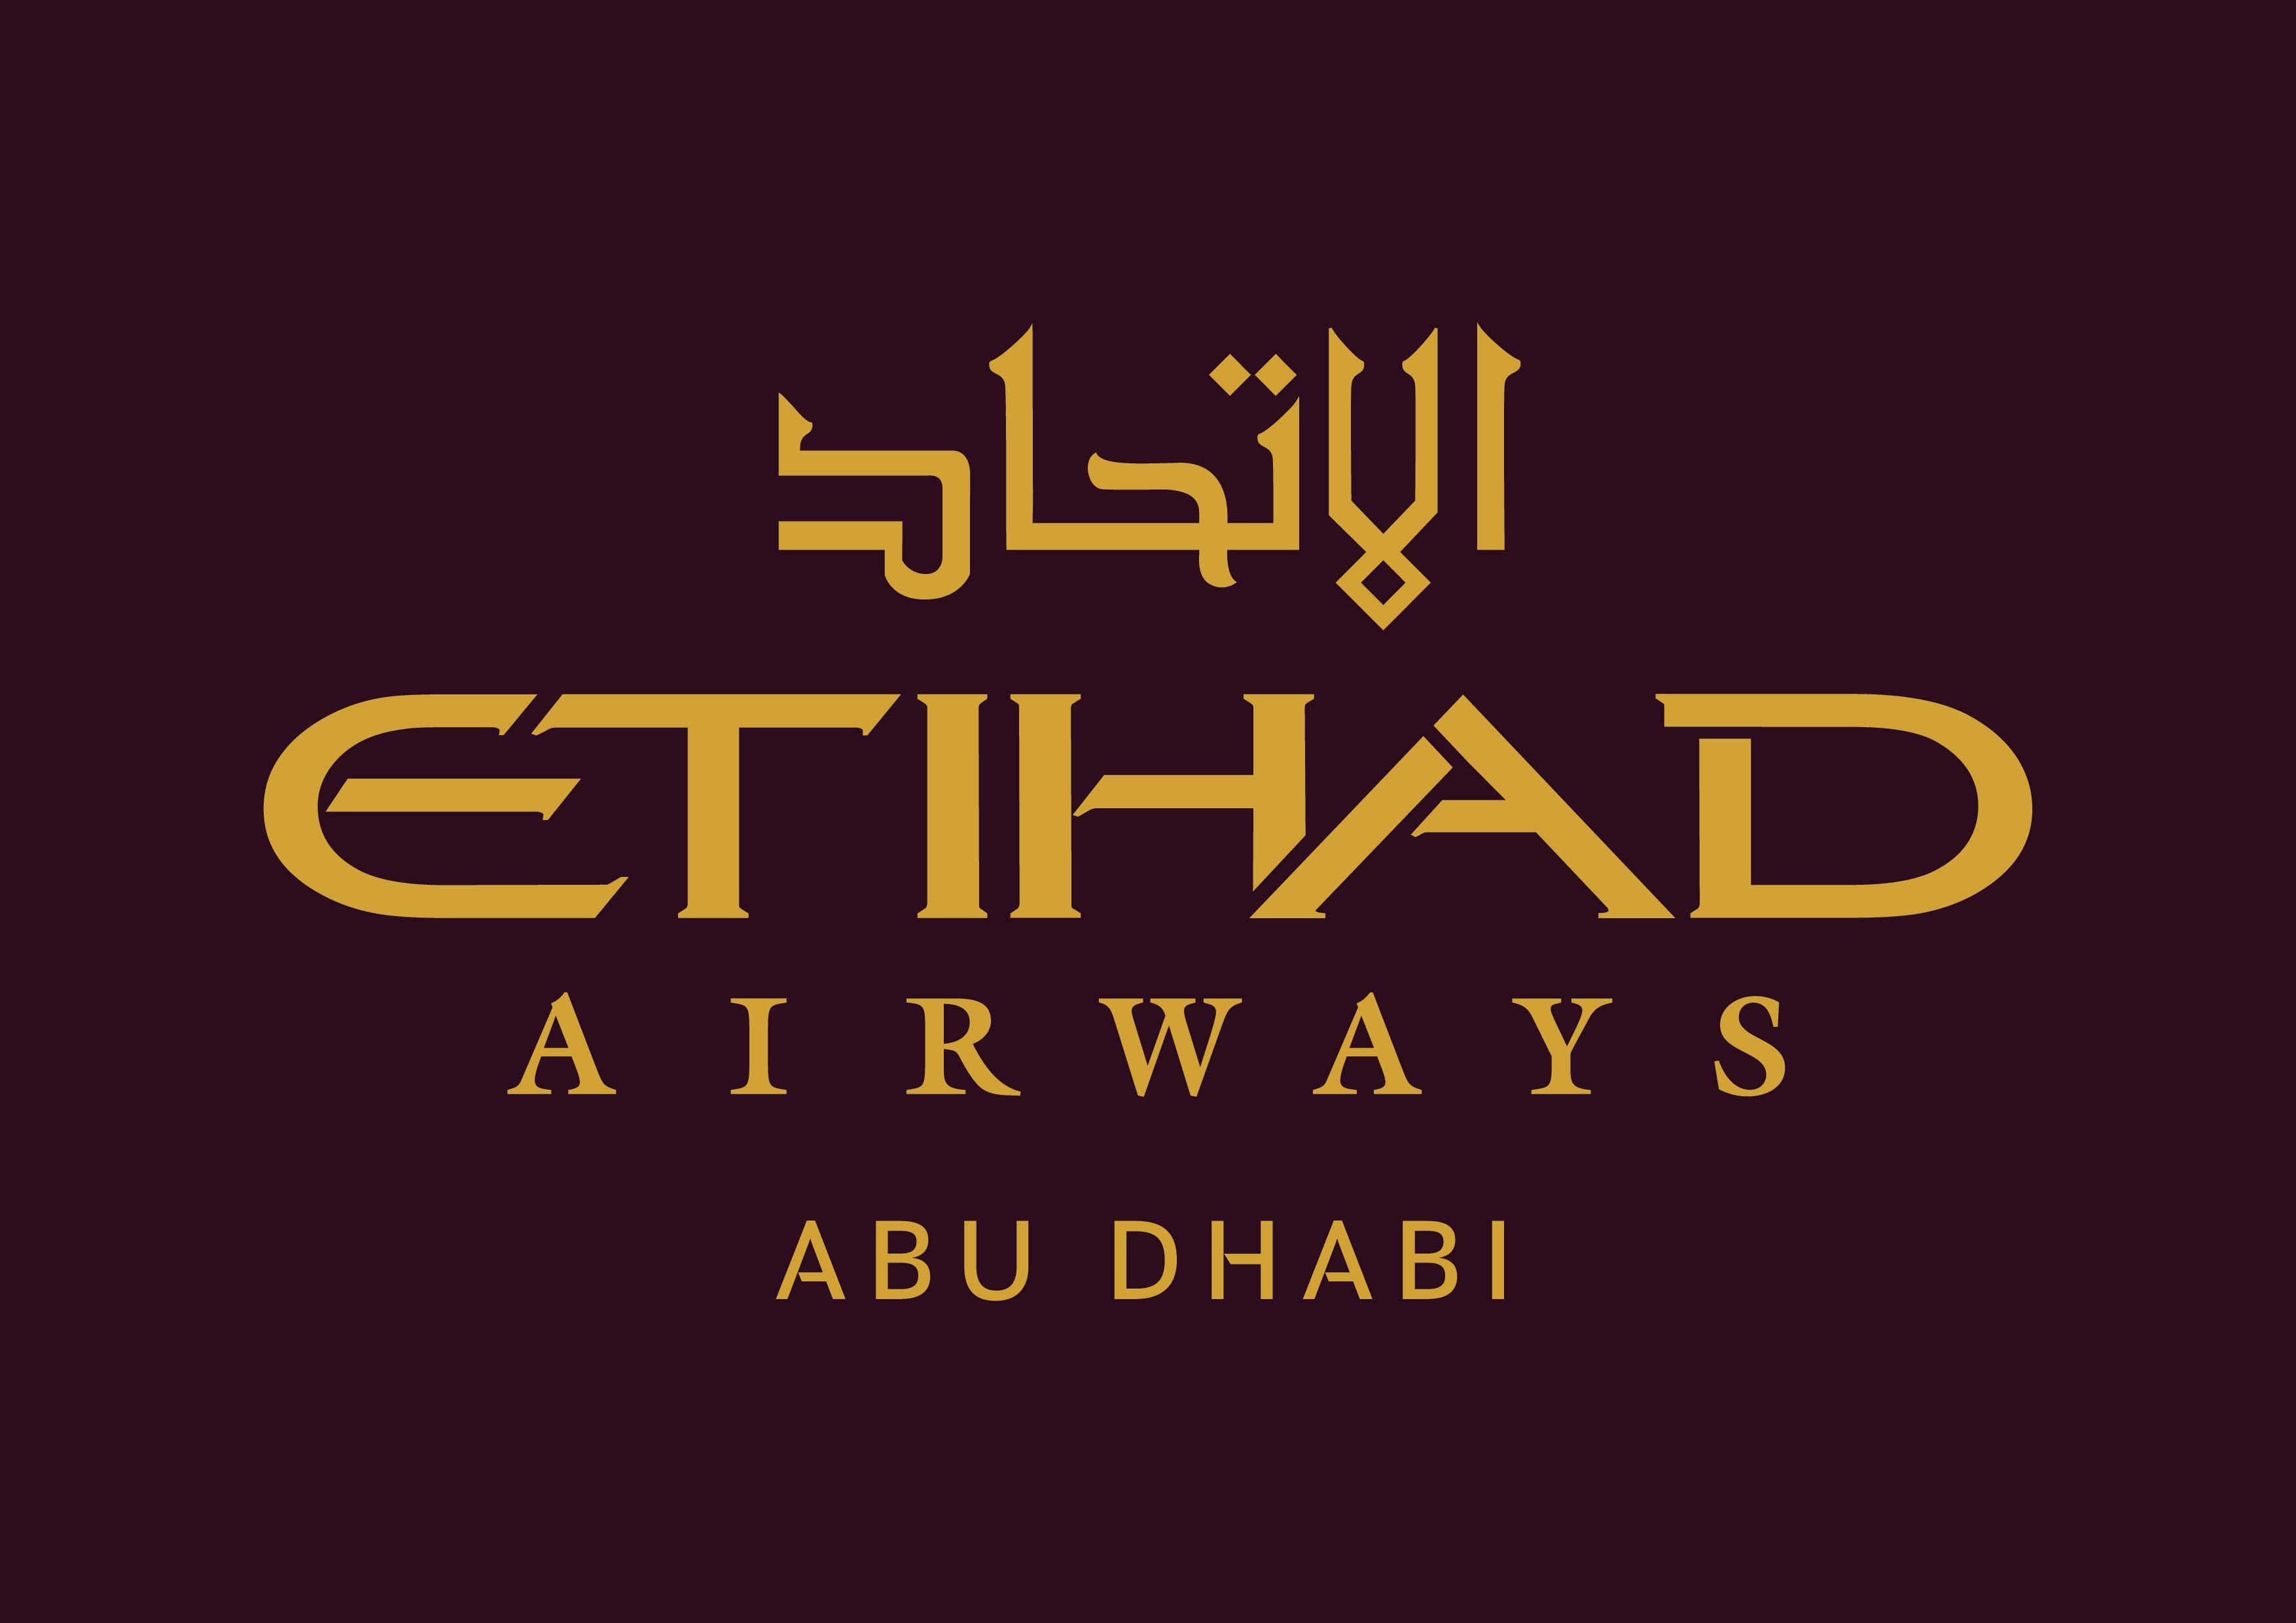 Pin By Paradiesvogel On Wonderful Abu Dhabi Flight Connections Etihad Business Class Best Flights